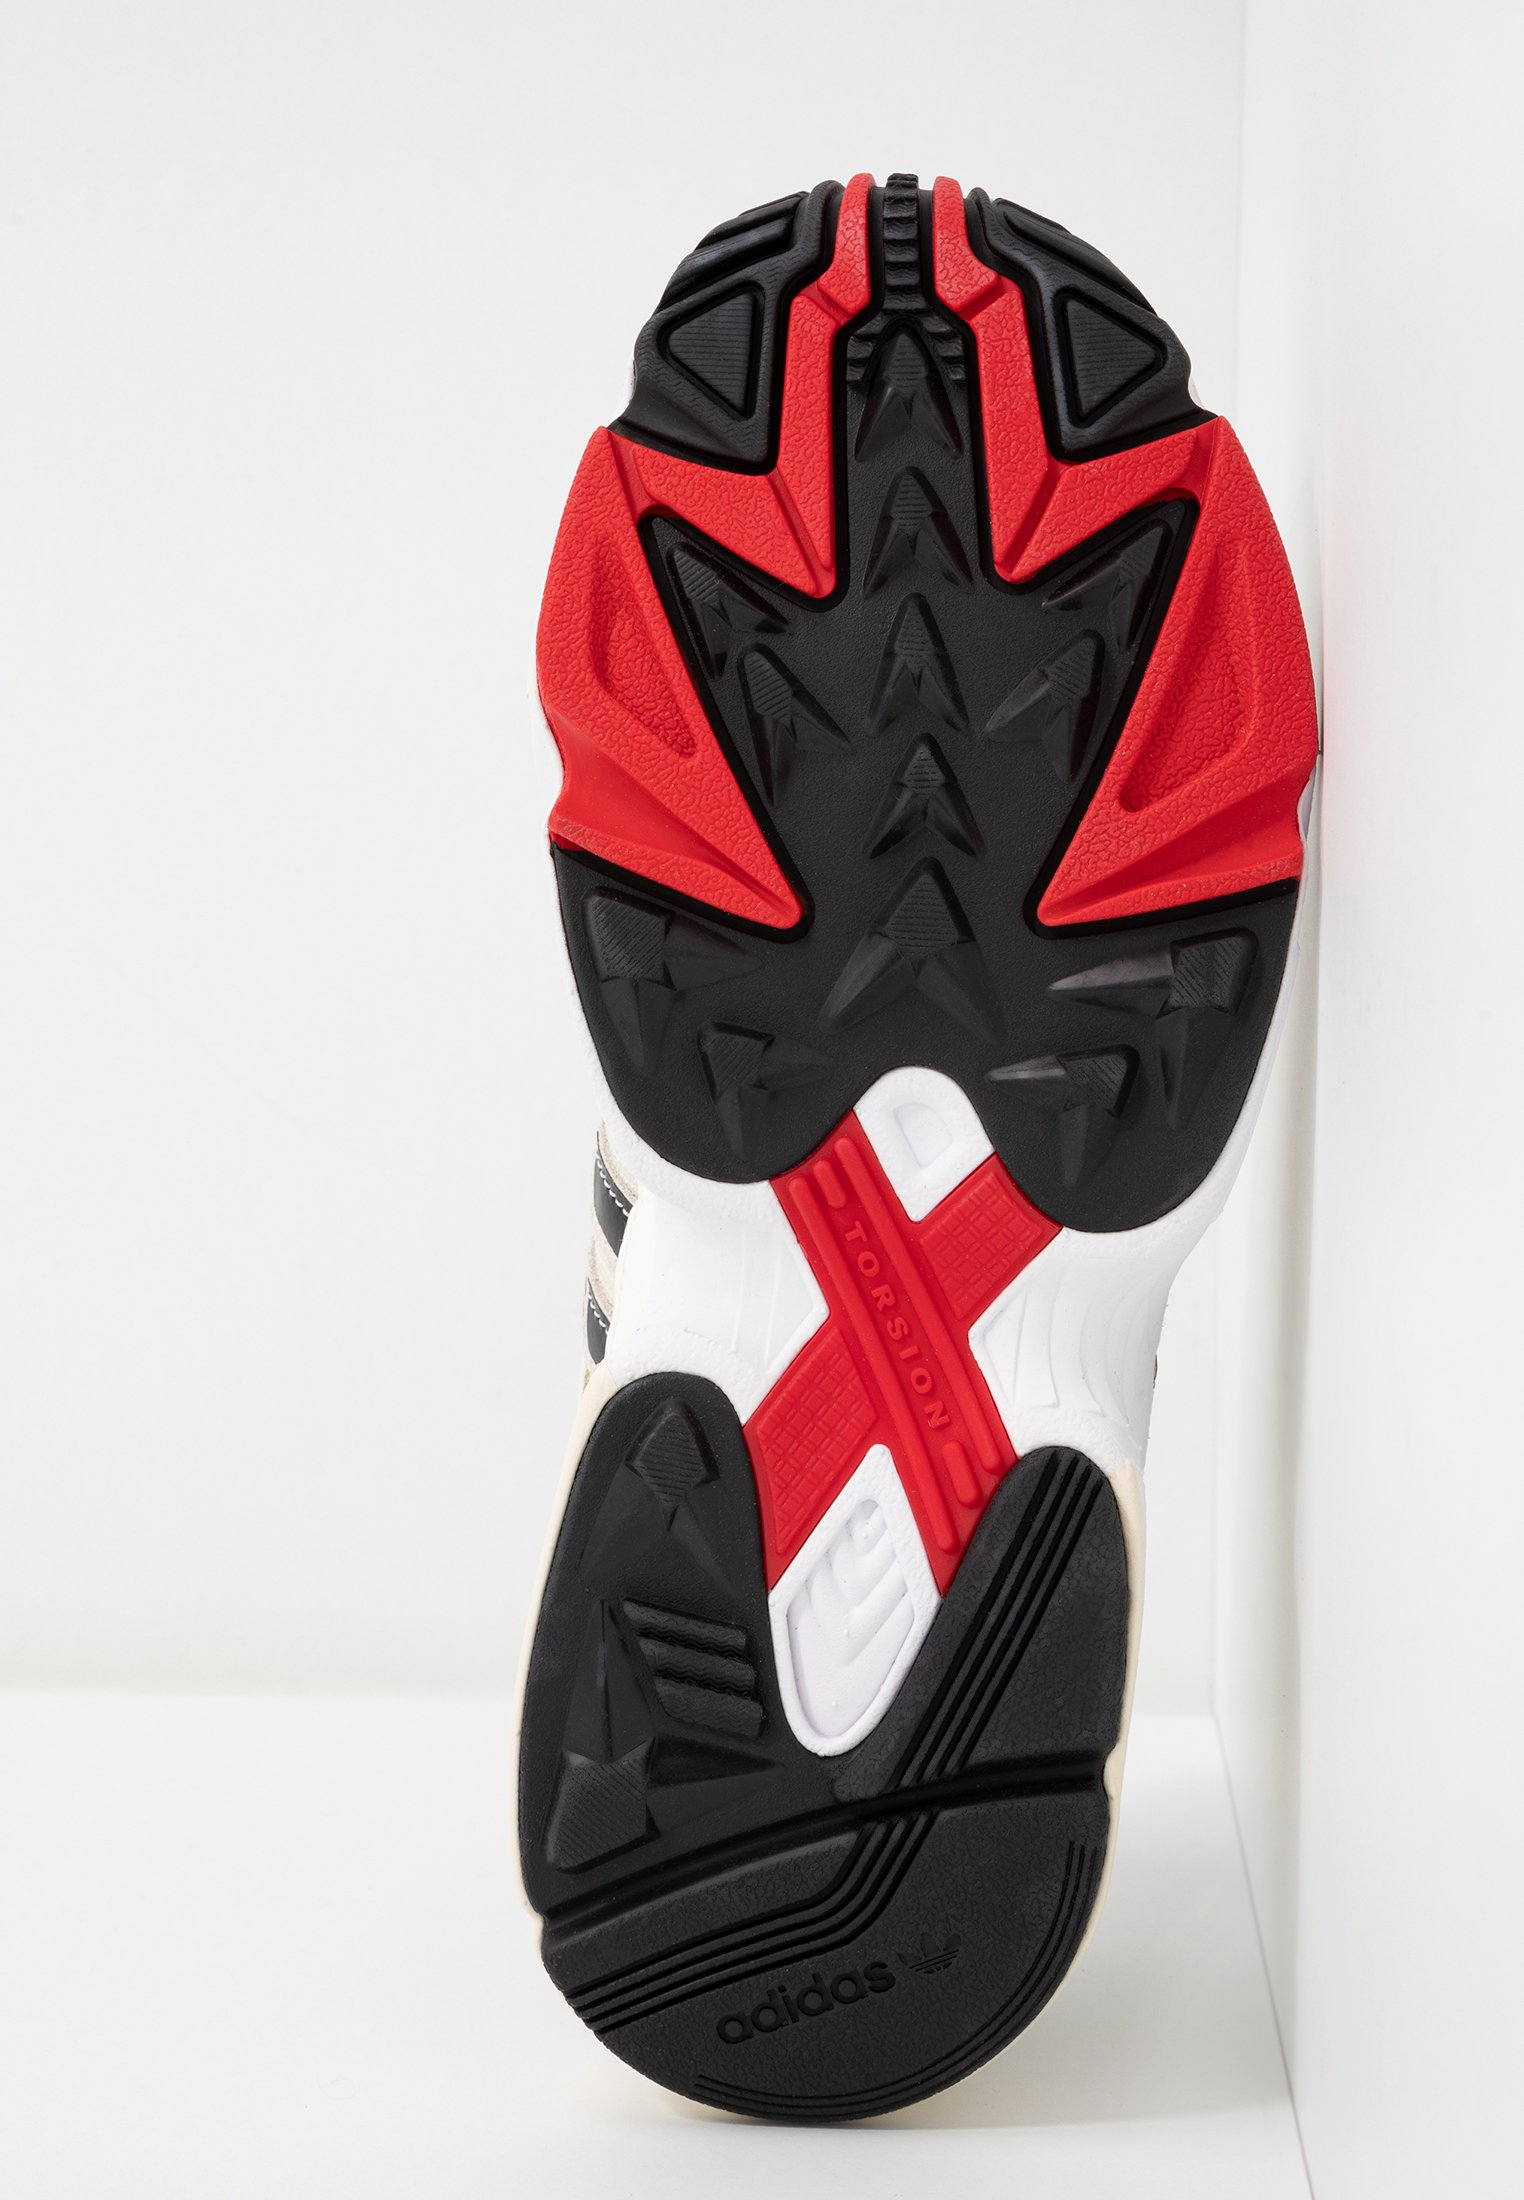 Adidas Originals 2000 W - Baskets Basses Chalk White/offwhite/scarlet oFmIOIv